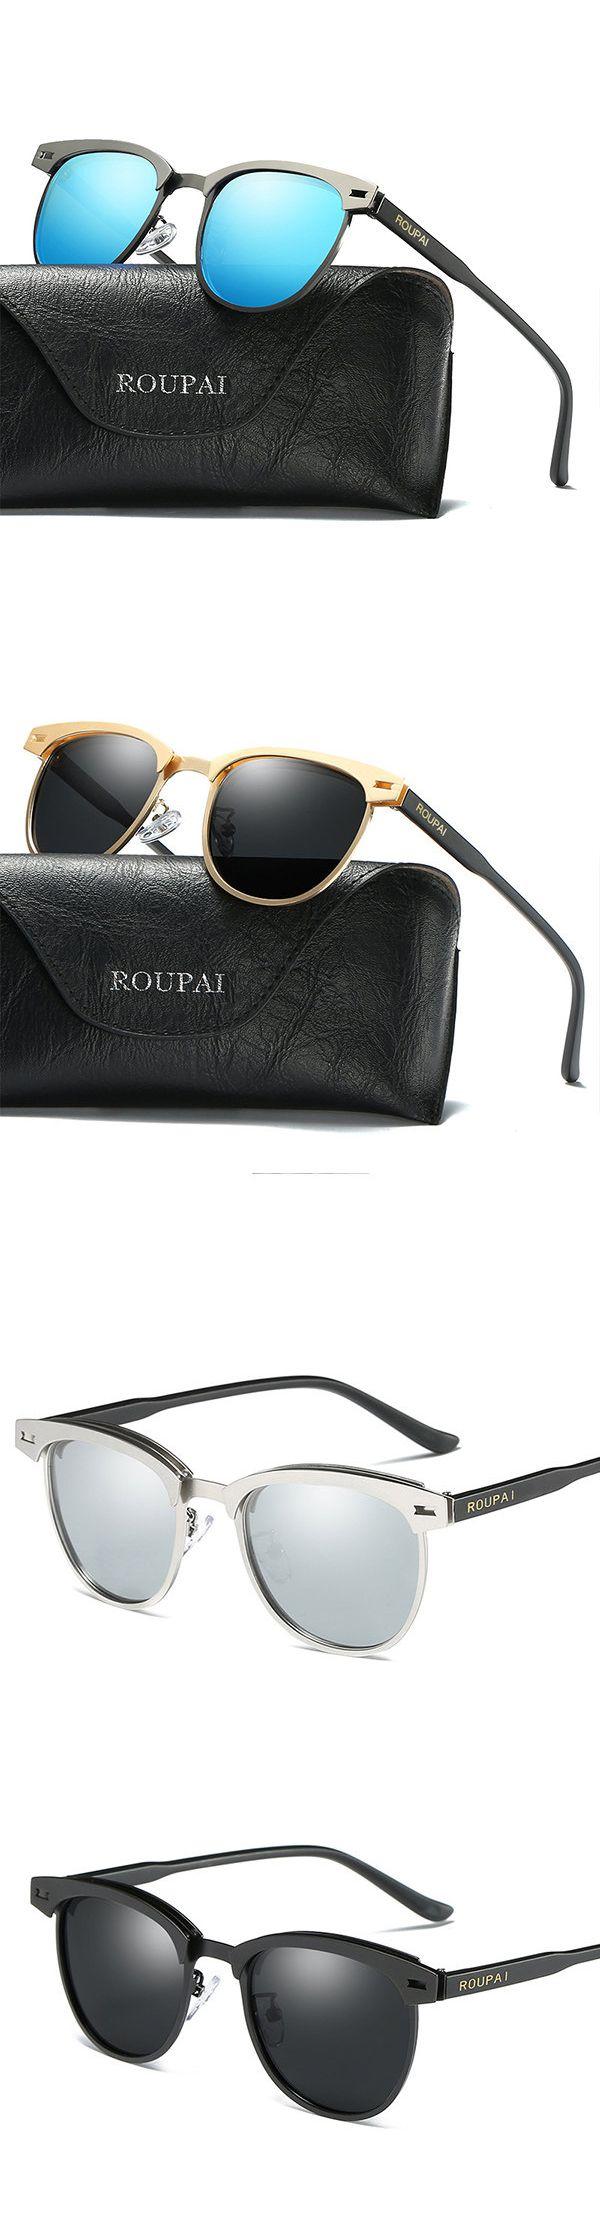 Retro Casual Anti-UV Polarized Sunglasses Travel Eye Protection Metal Frame Glasses For Women Men